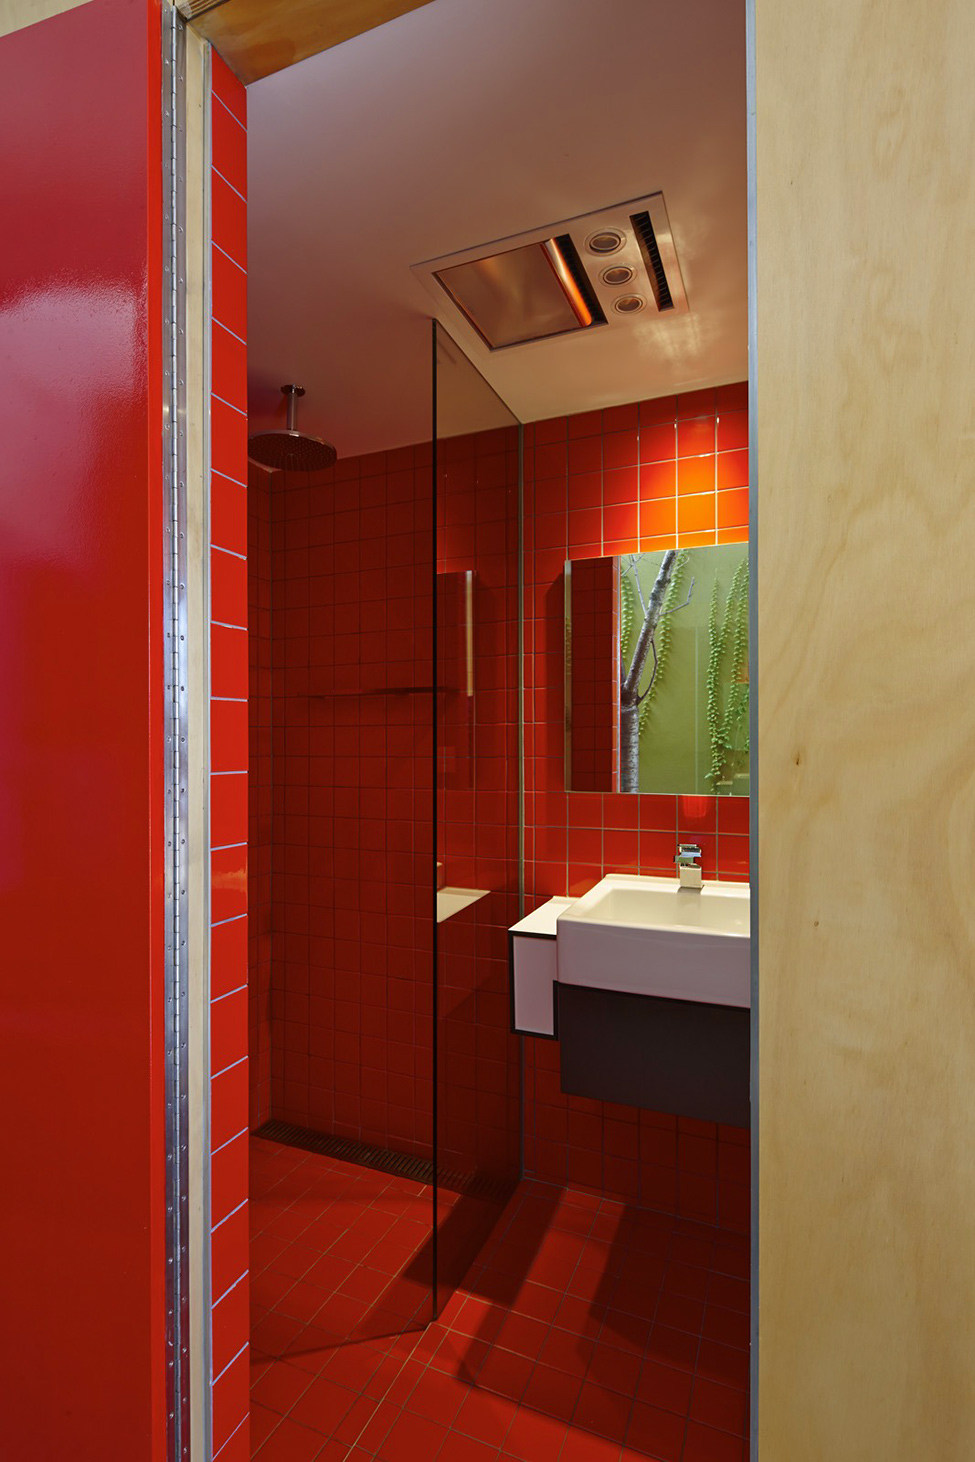 renovate classic to modern townhome australia (3)